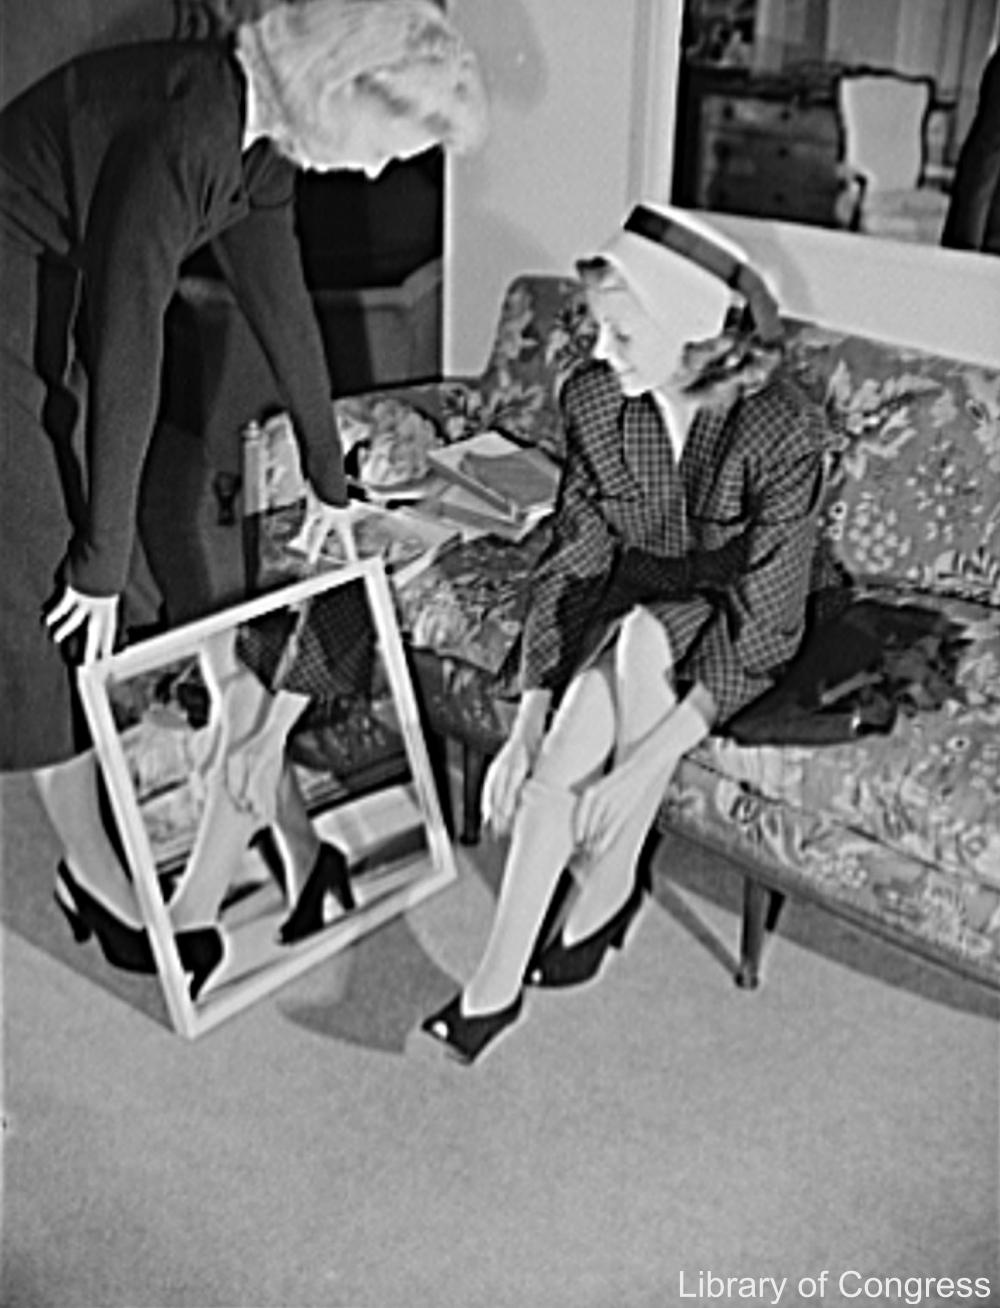 Rita Hayworth Promoting Cotton Stockings for the War Effort